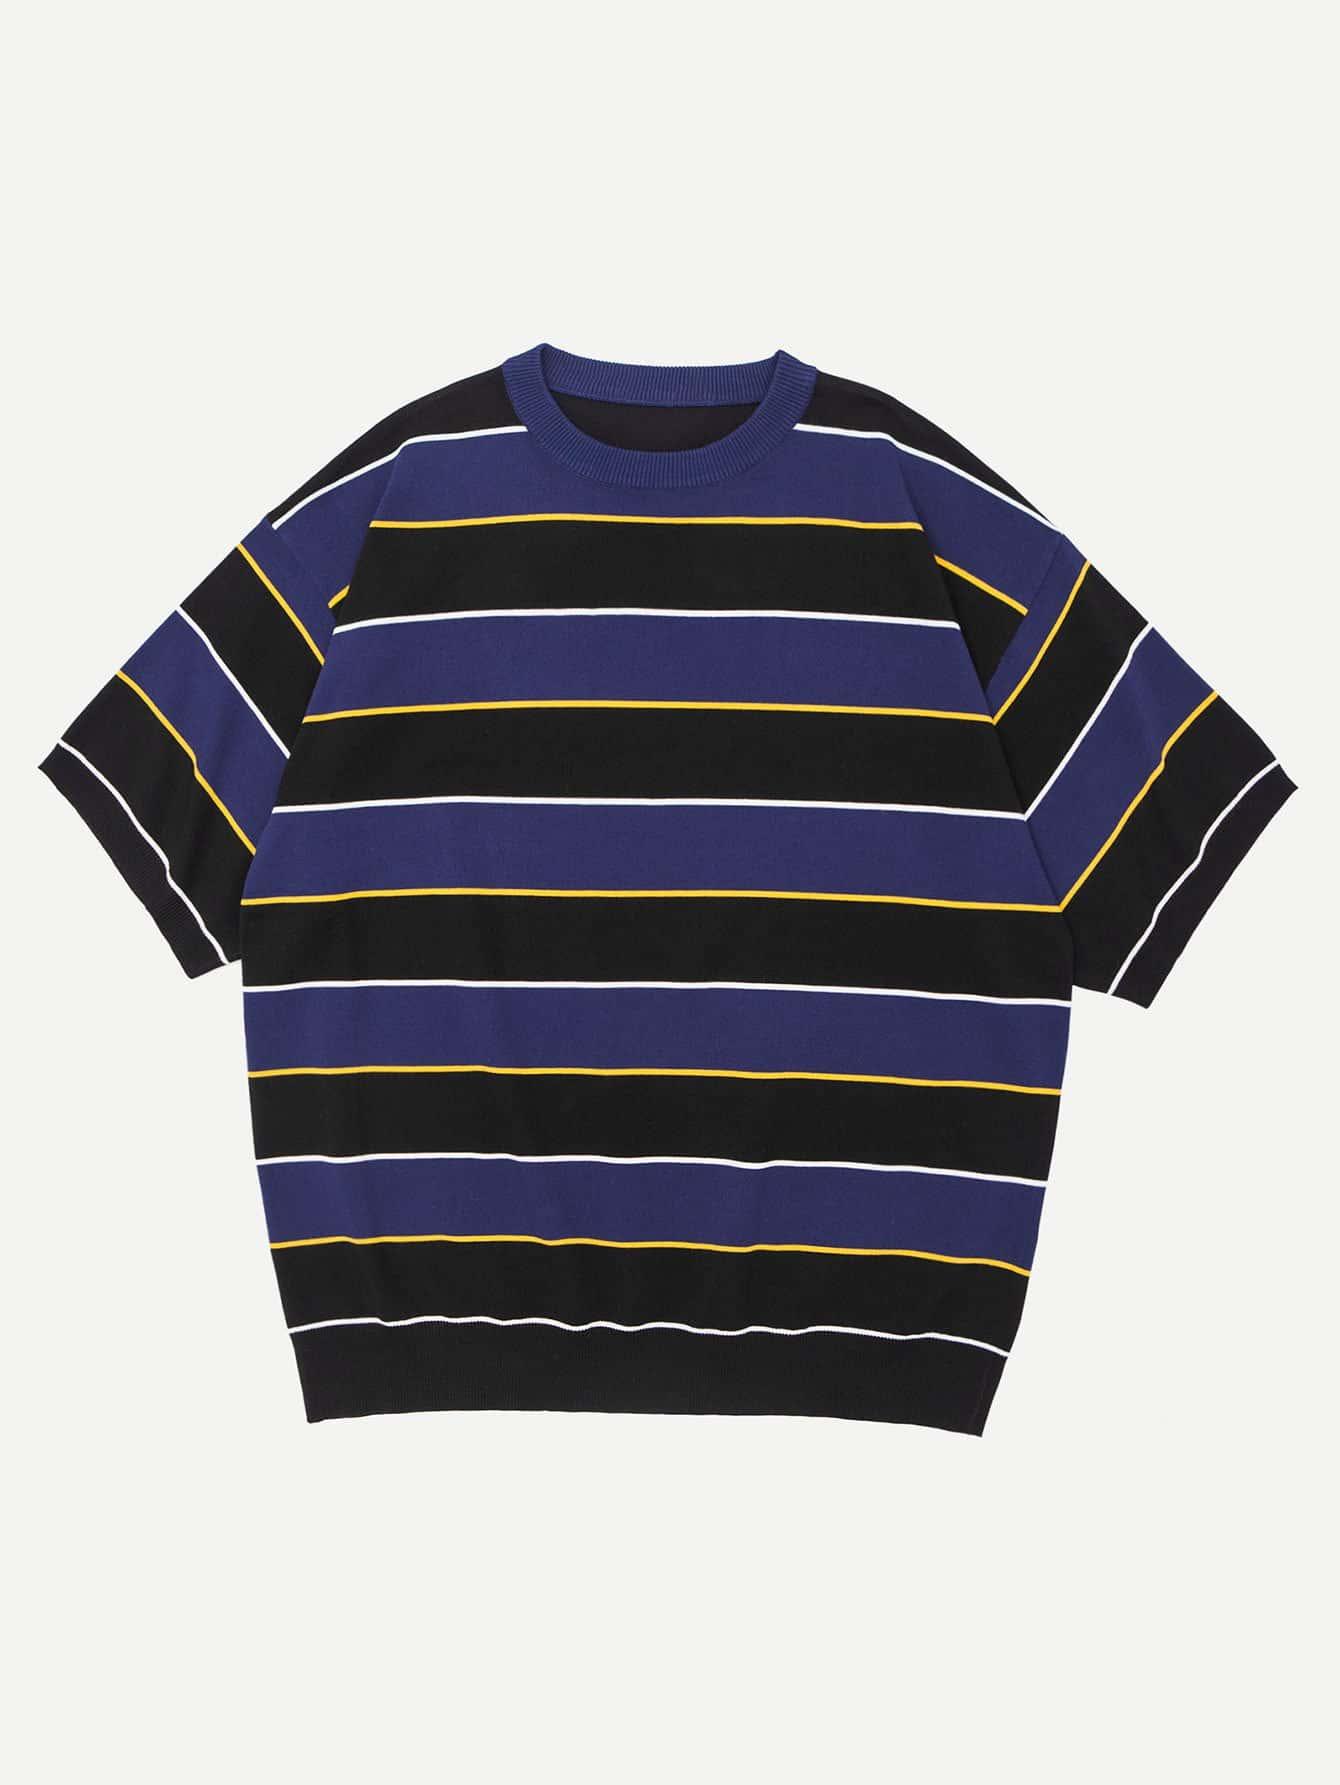 Men Striped Crop Tee striped mesh sweetheart crop tee